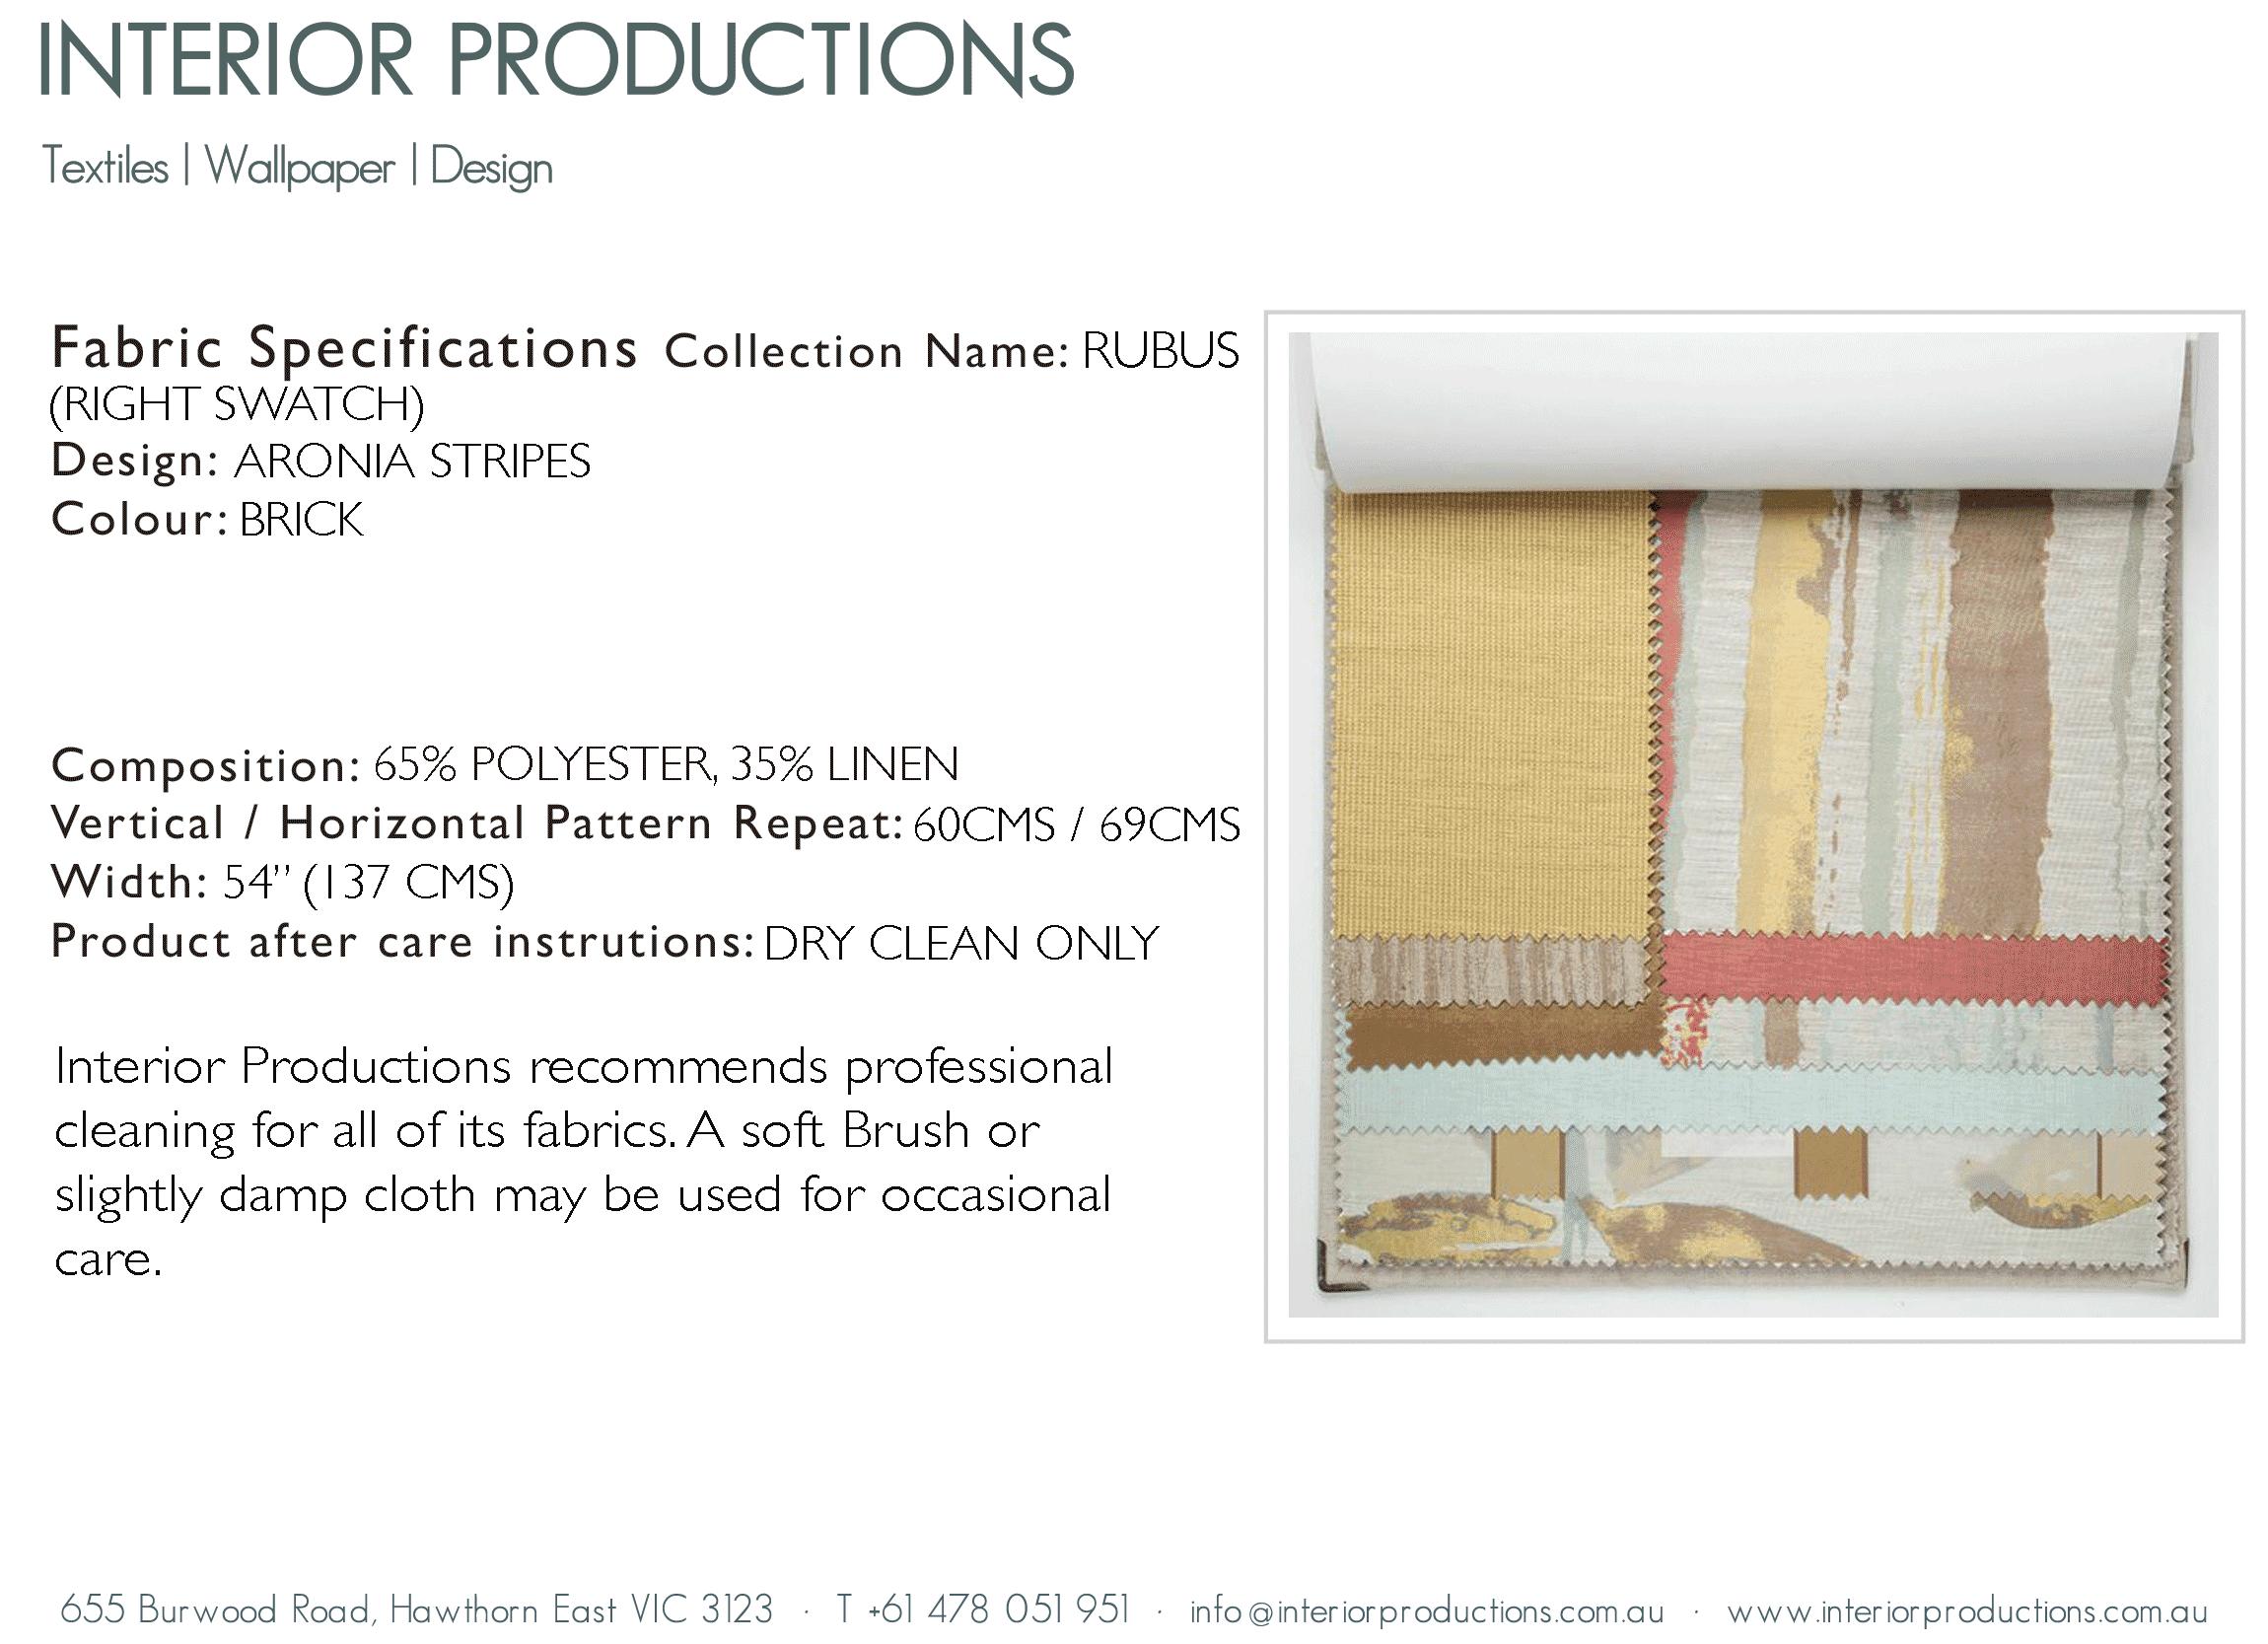 interior_productions_ARONIA-STRIPES---BRICK